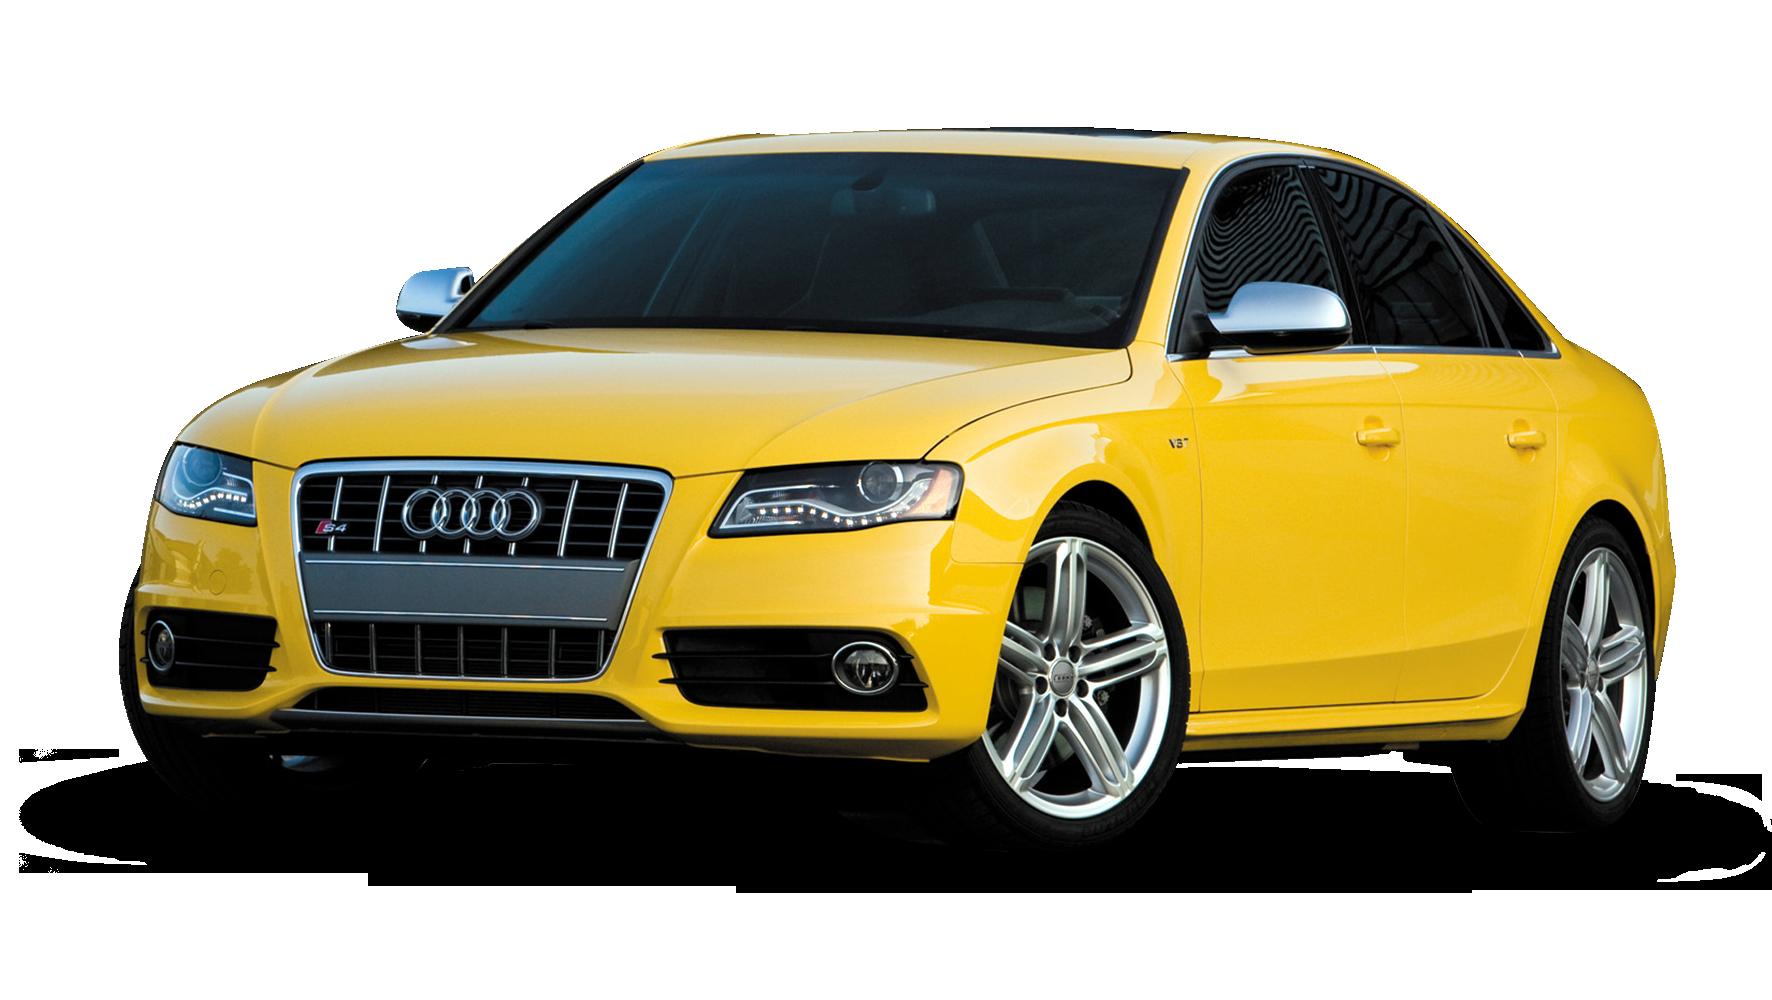 Yellow Audi Car PNG image